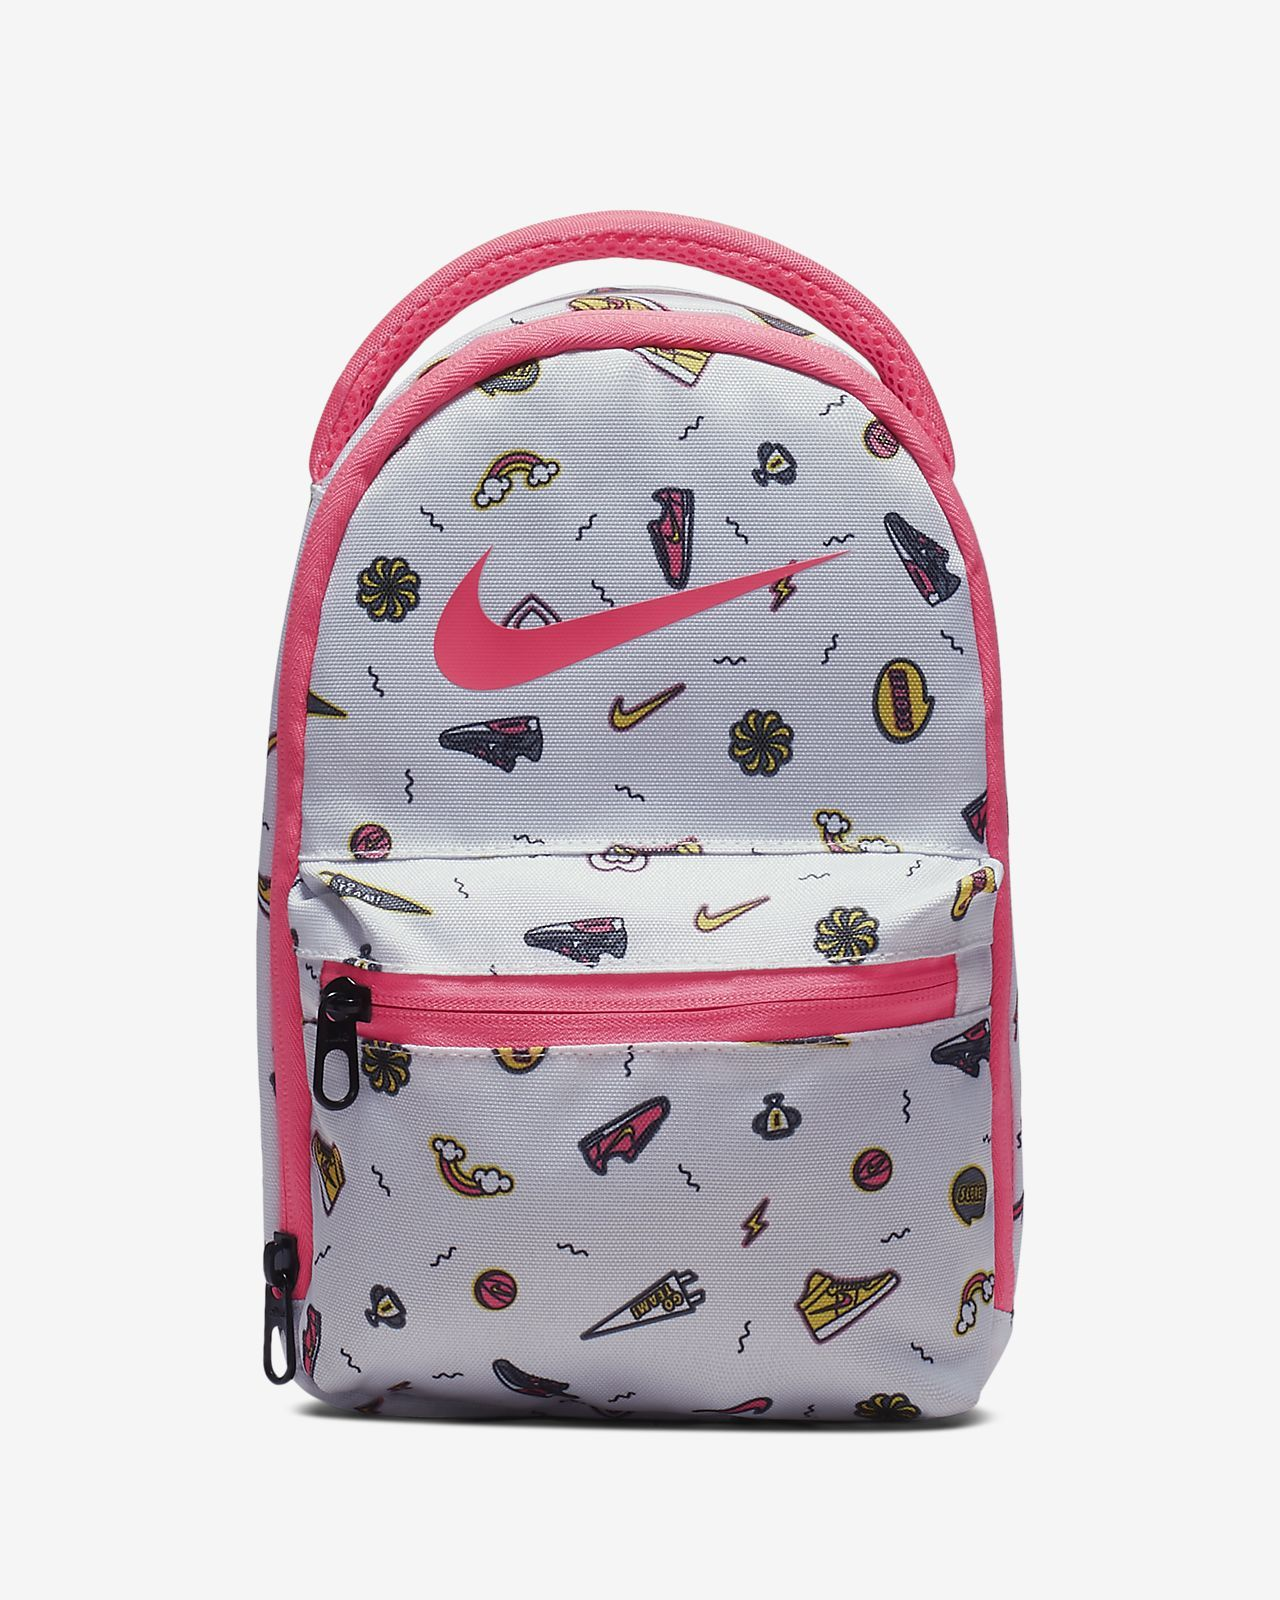 61202e26ade Nike My Nike Fuel Pack Kids  Lunch Bag   KIDZ   Pinterest   Kids ...